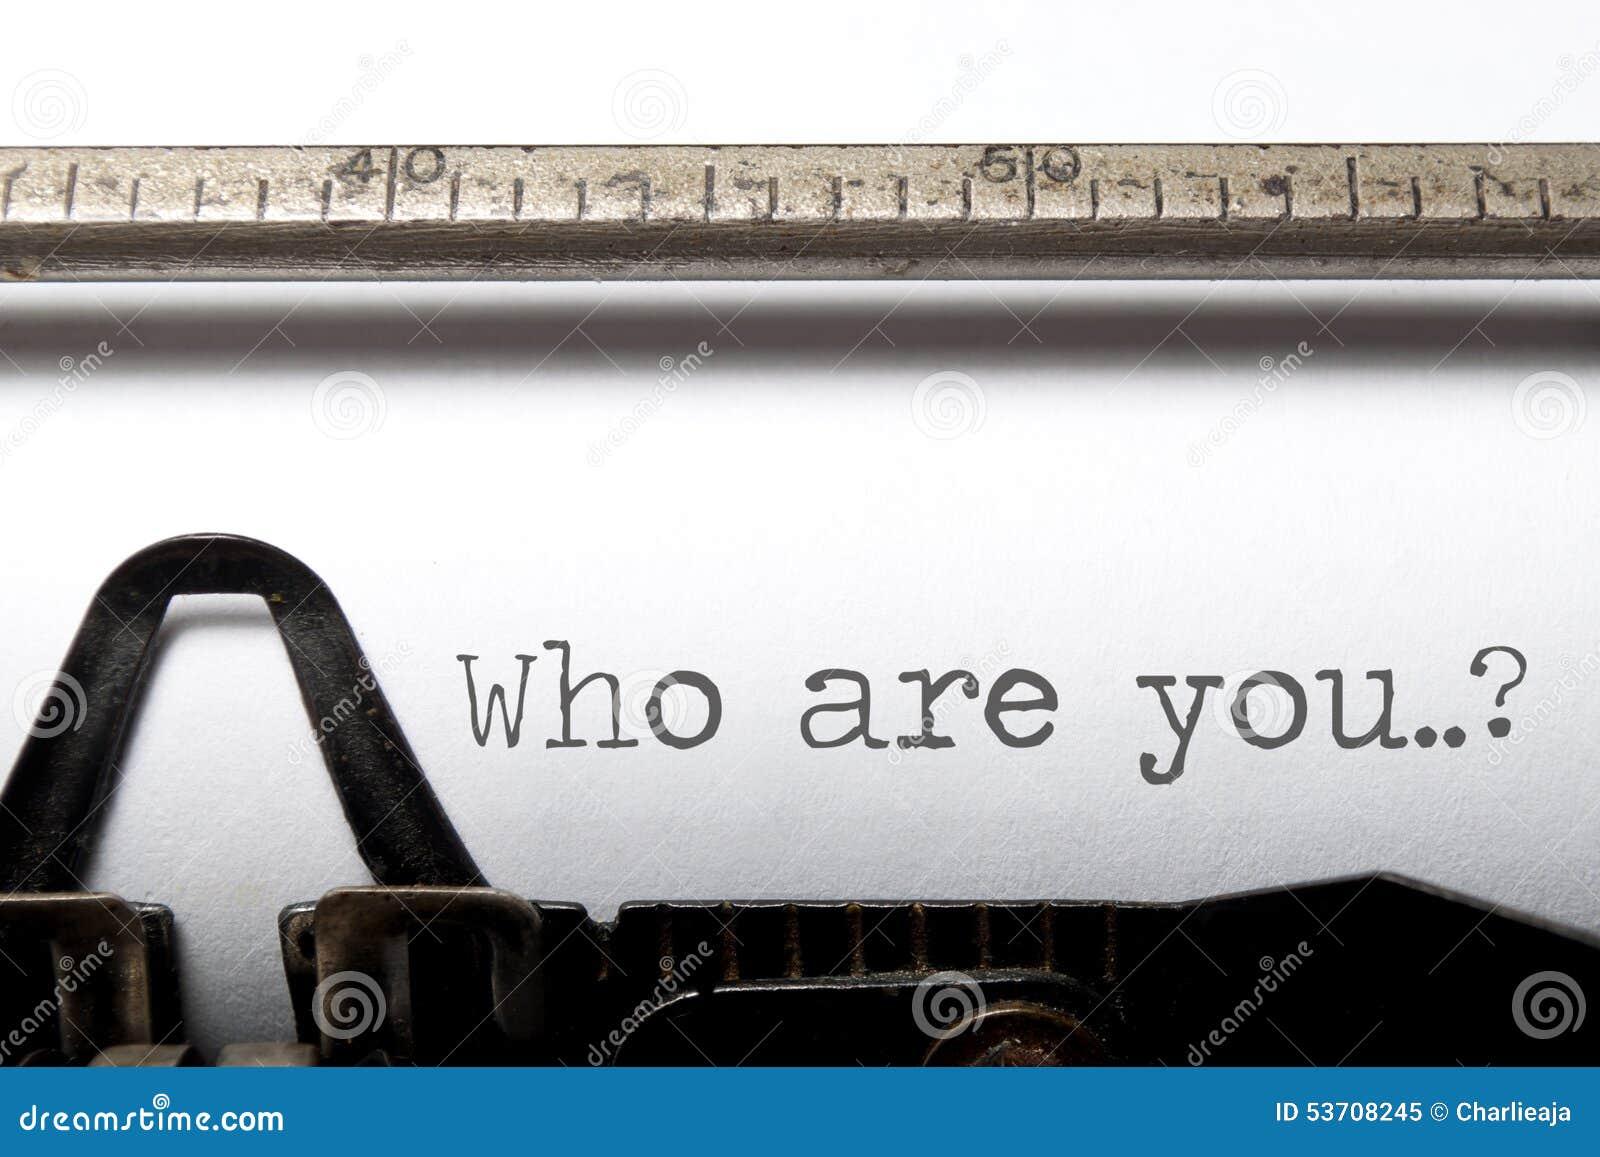 Who is u?